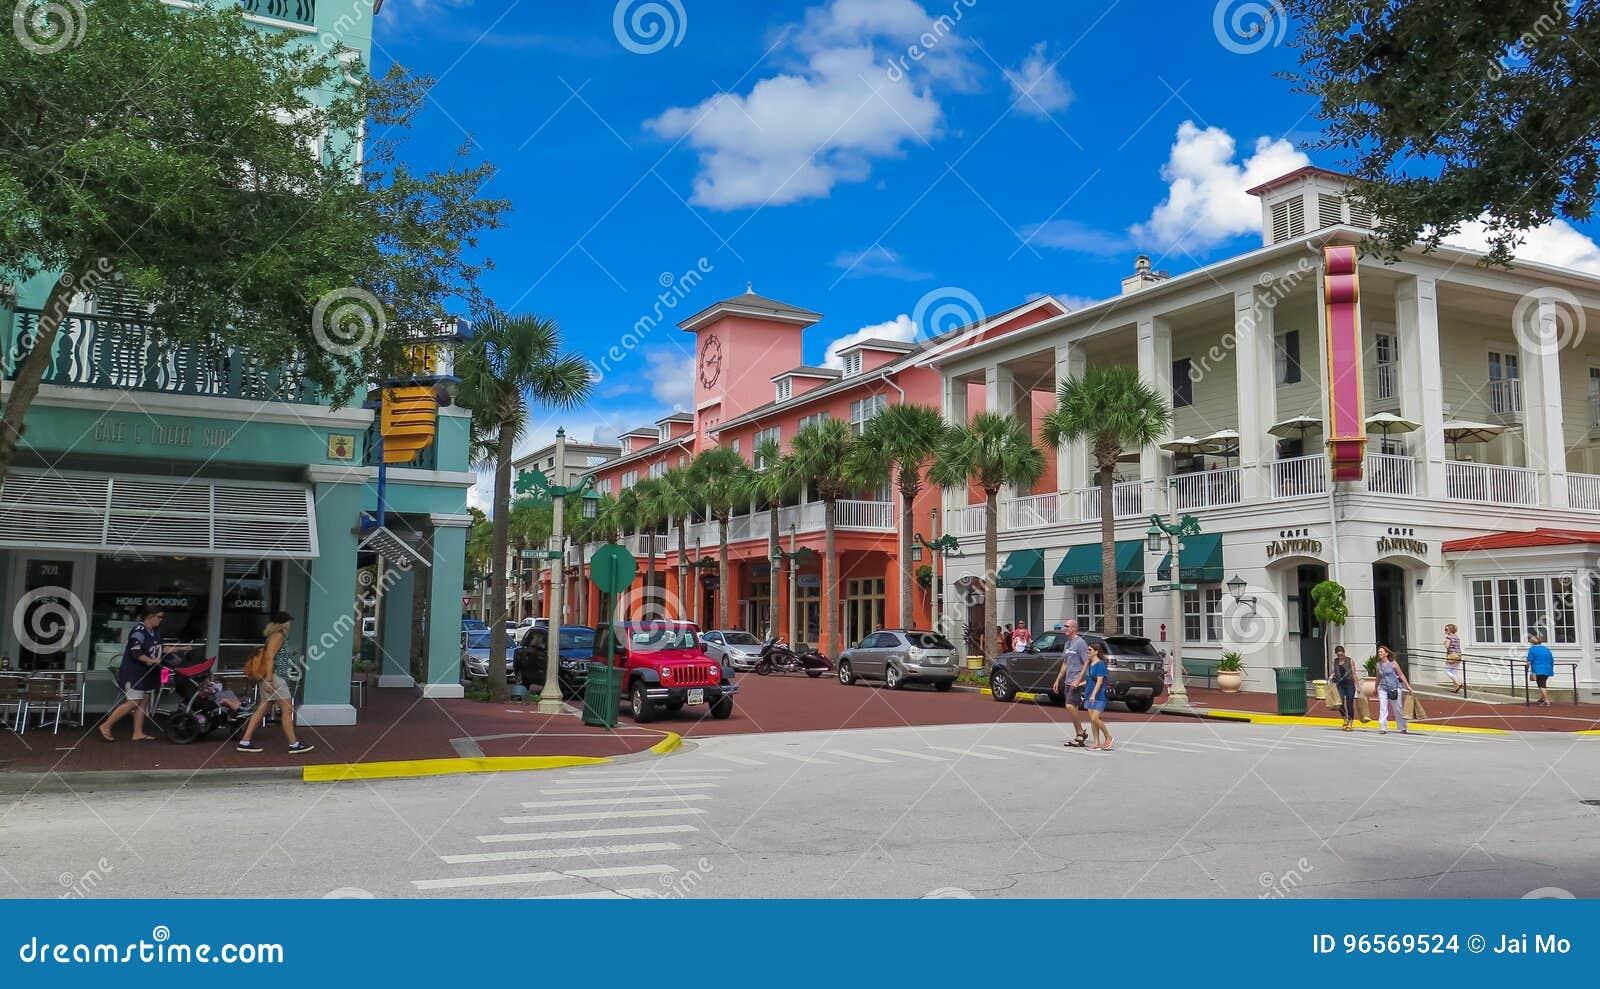 West Florida city - Daily Celebrity Crossword